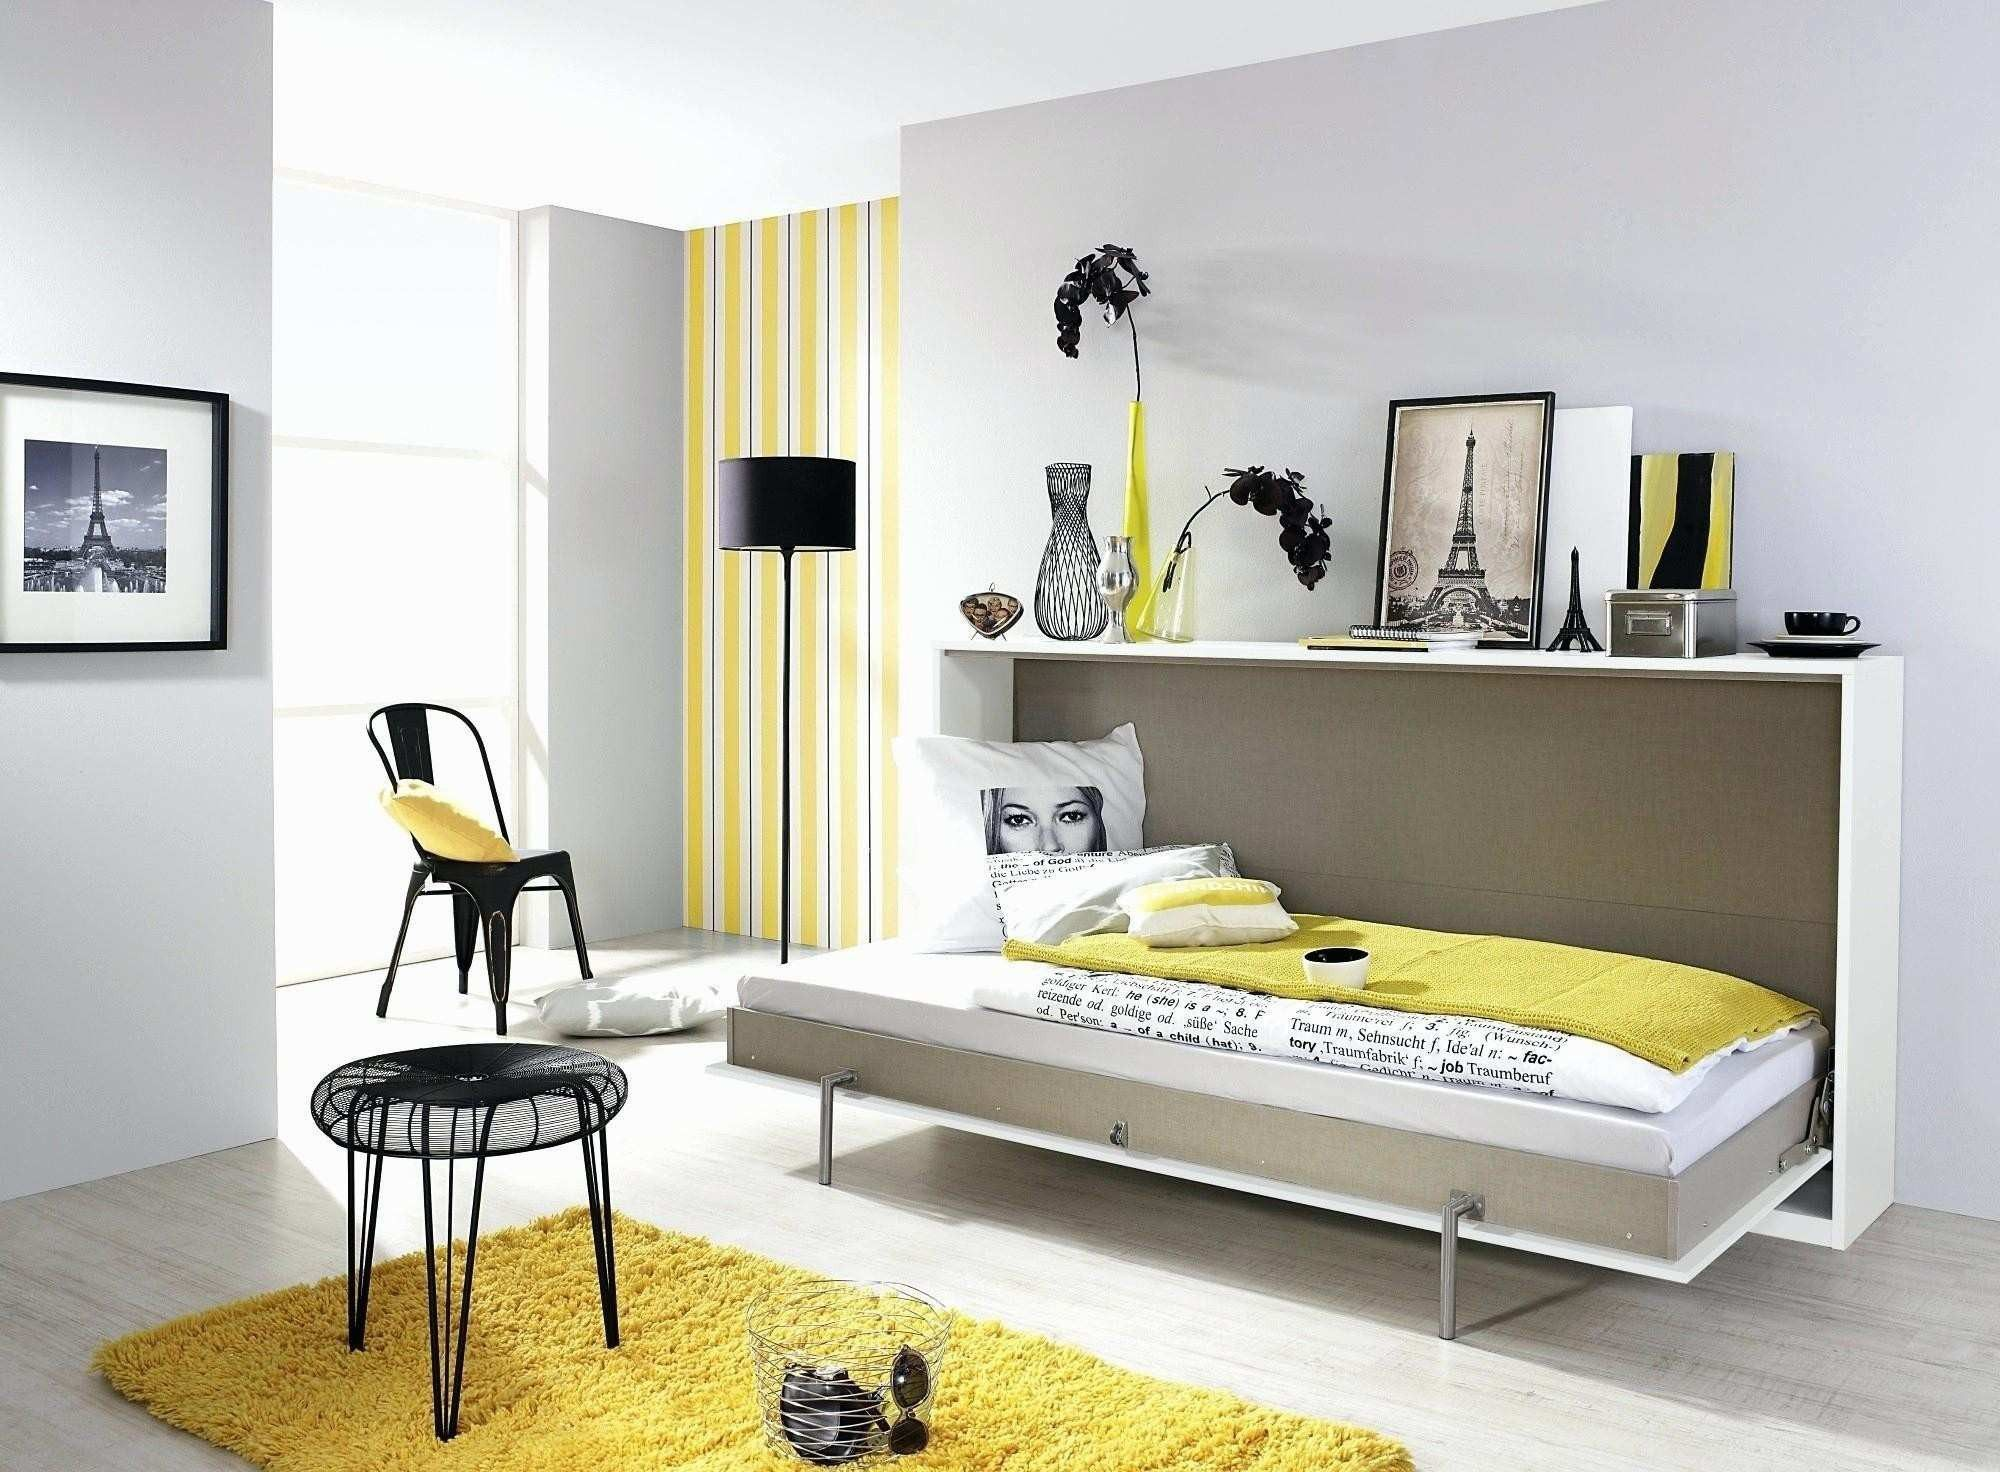 Lit Superposé Escamotable Ikea Joli Lit Mezzanine Bureau Armoire Lit Convertible 2 Places Ikea Canape 2